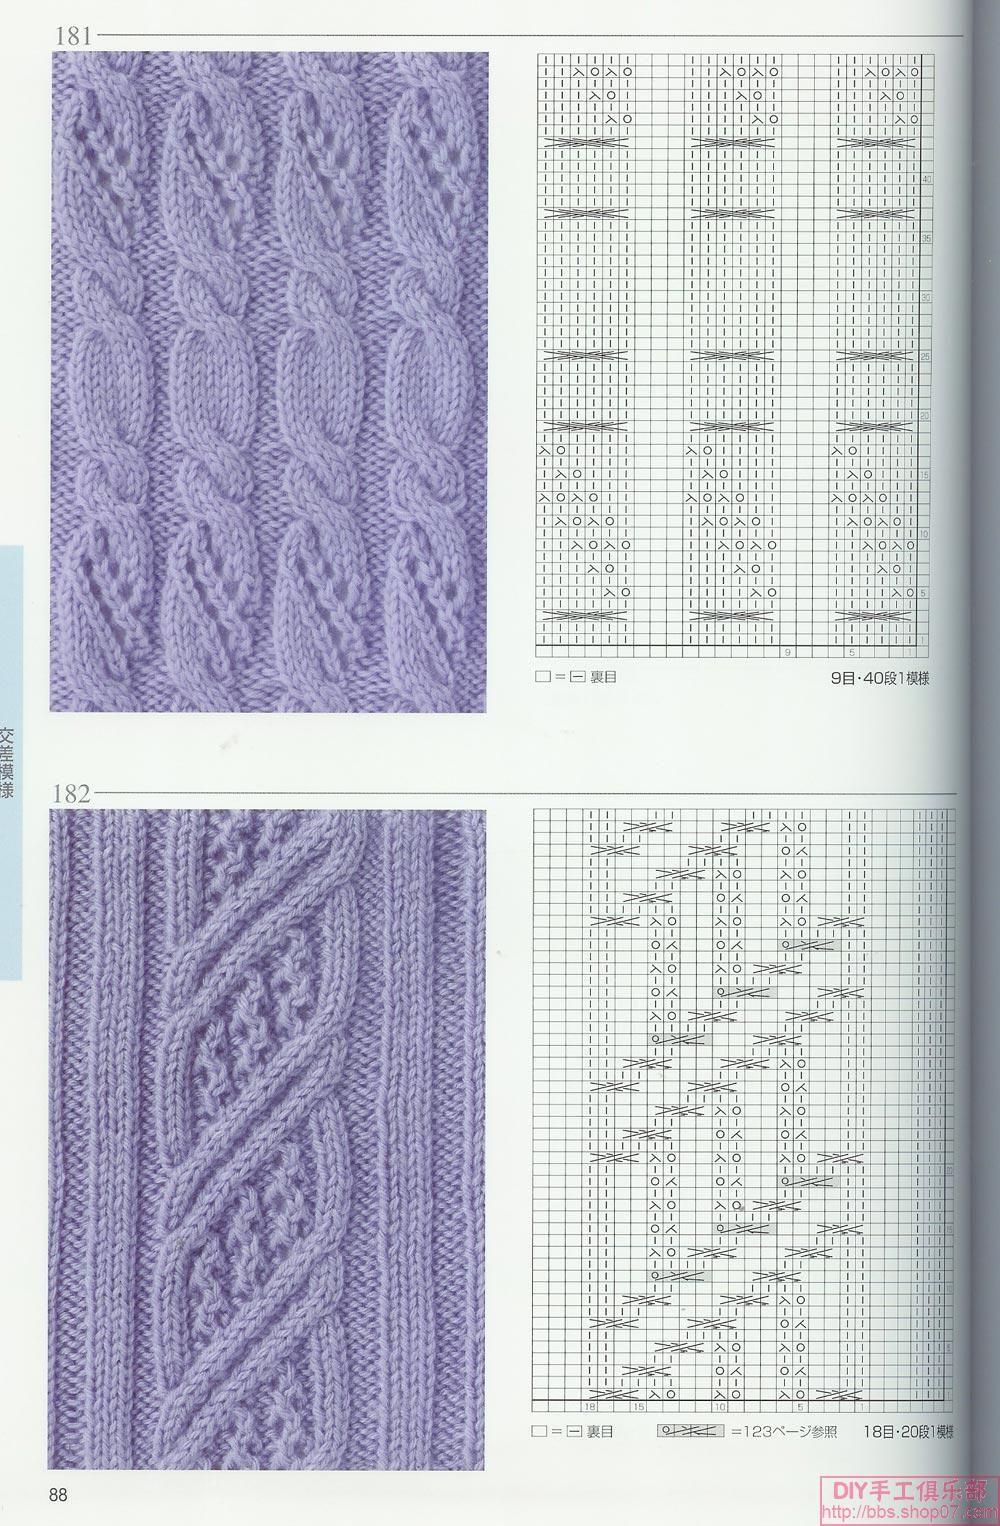 Pin de kavithagowda en knitting | Pinterest | Tejido, Dos agujas y ...